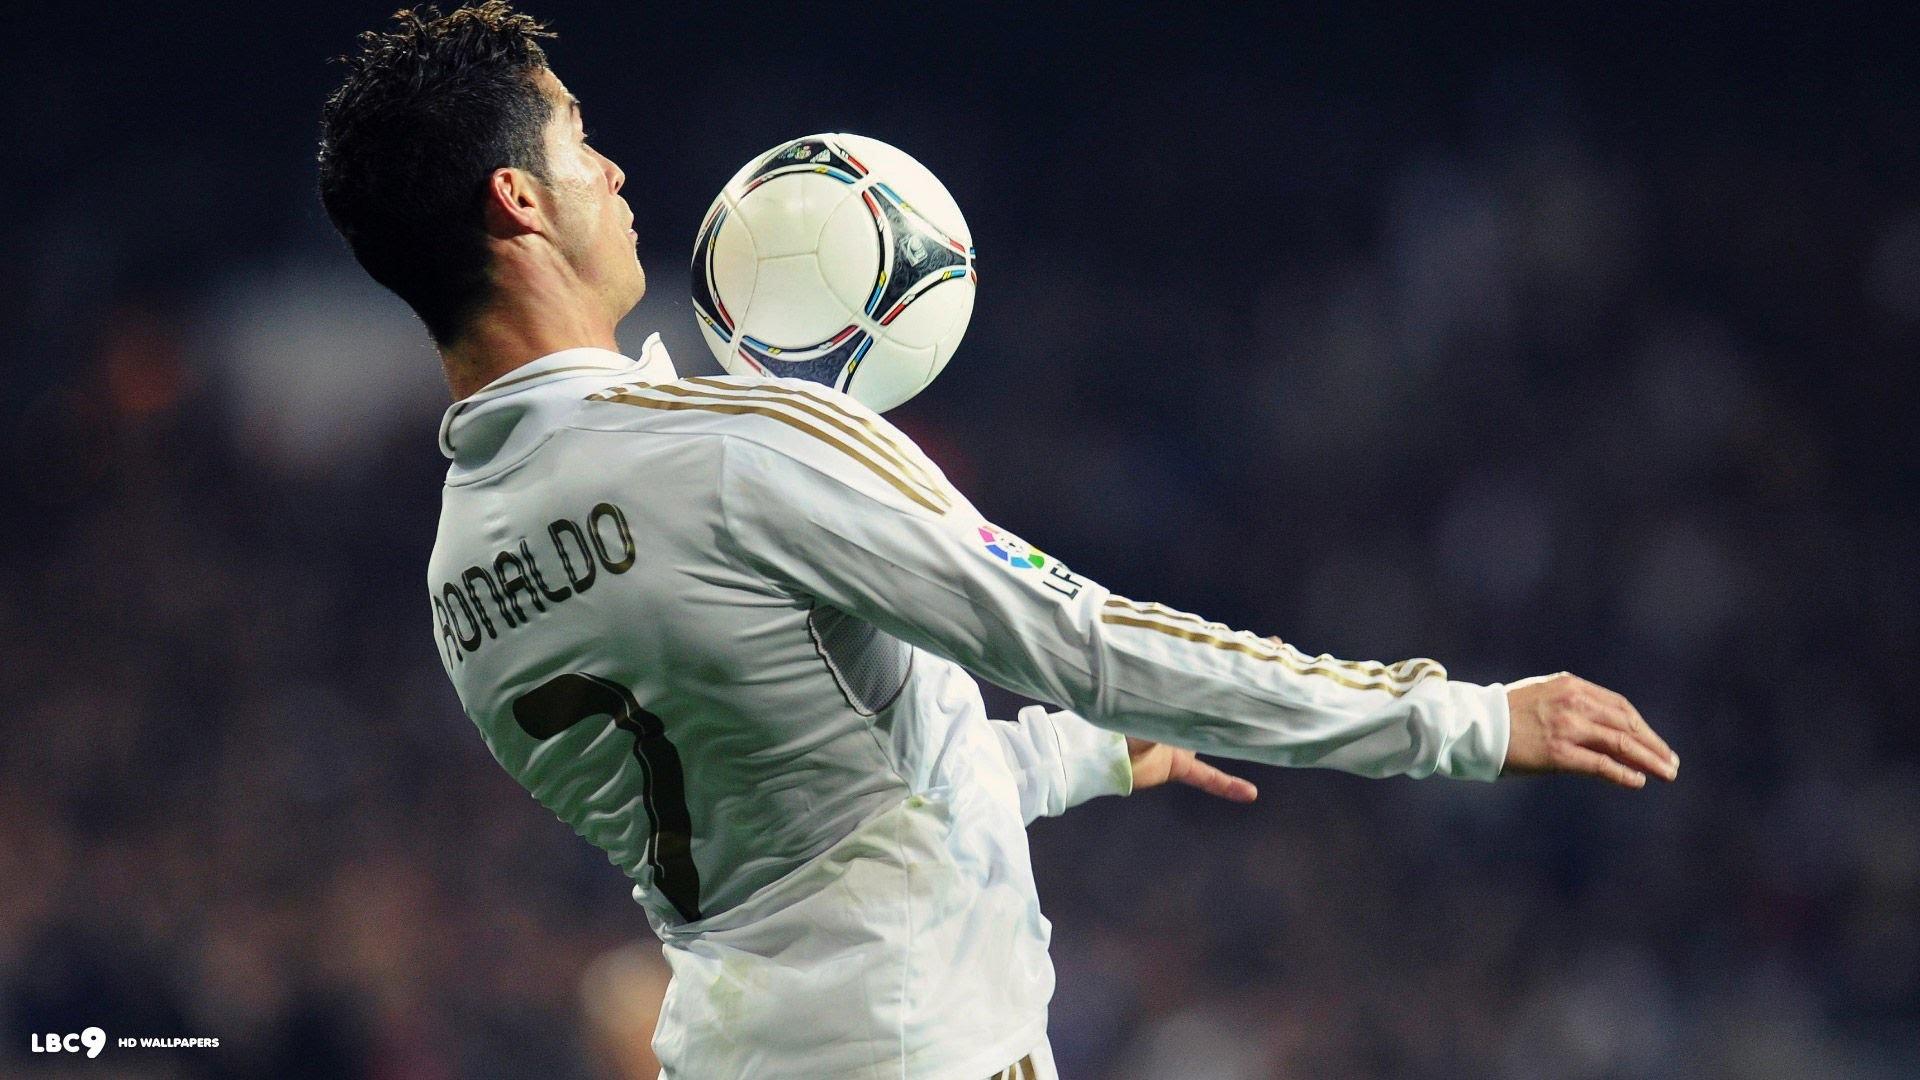 Cristiano Ronaldo | Predator | Skills & Goals | Real Madrid | 2015 | HD  1080p (NeoNino Contest)